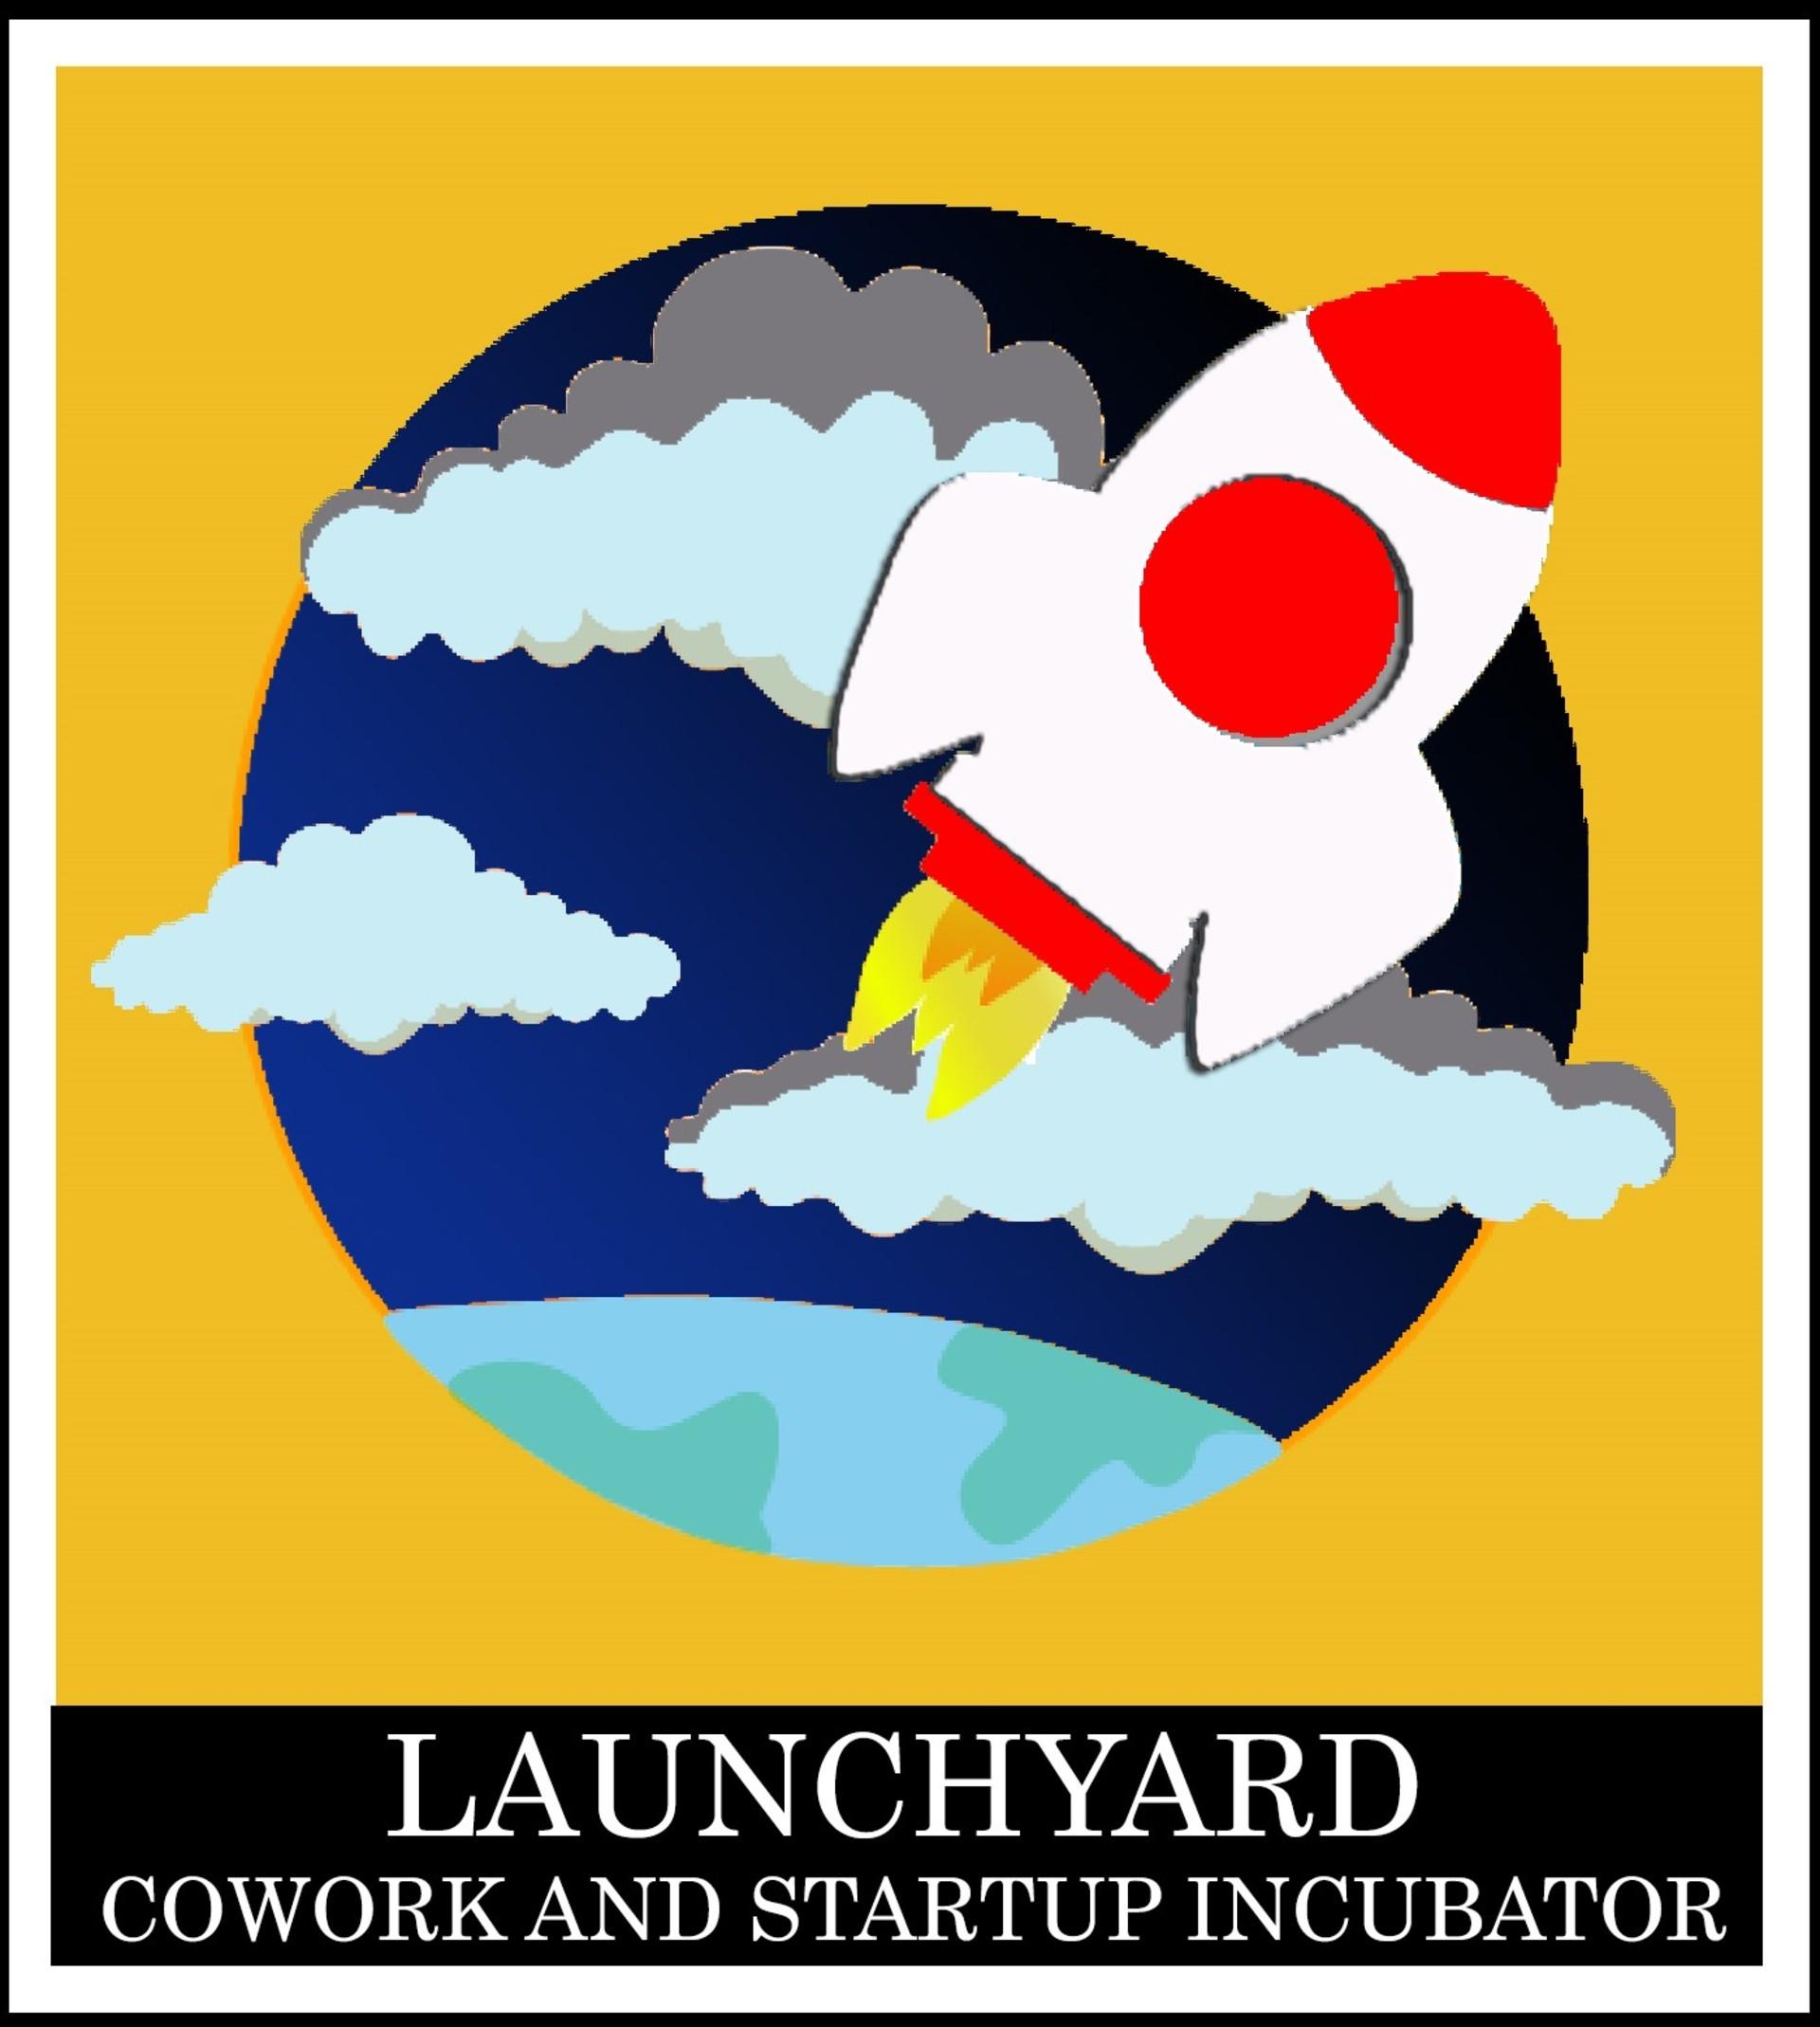 Launchyard Cowork and Start Up Incubator, New Chandigarh ...